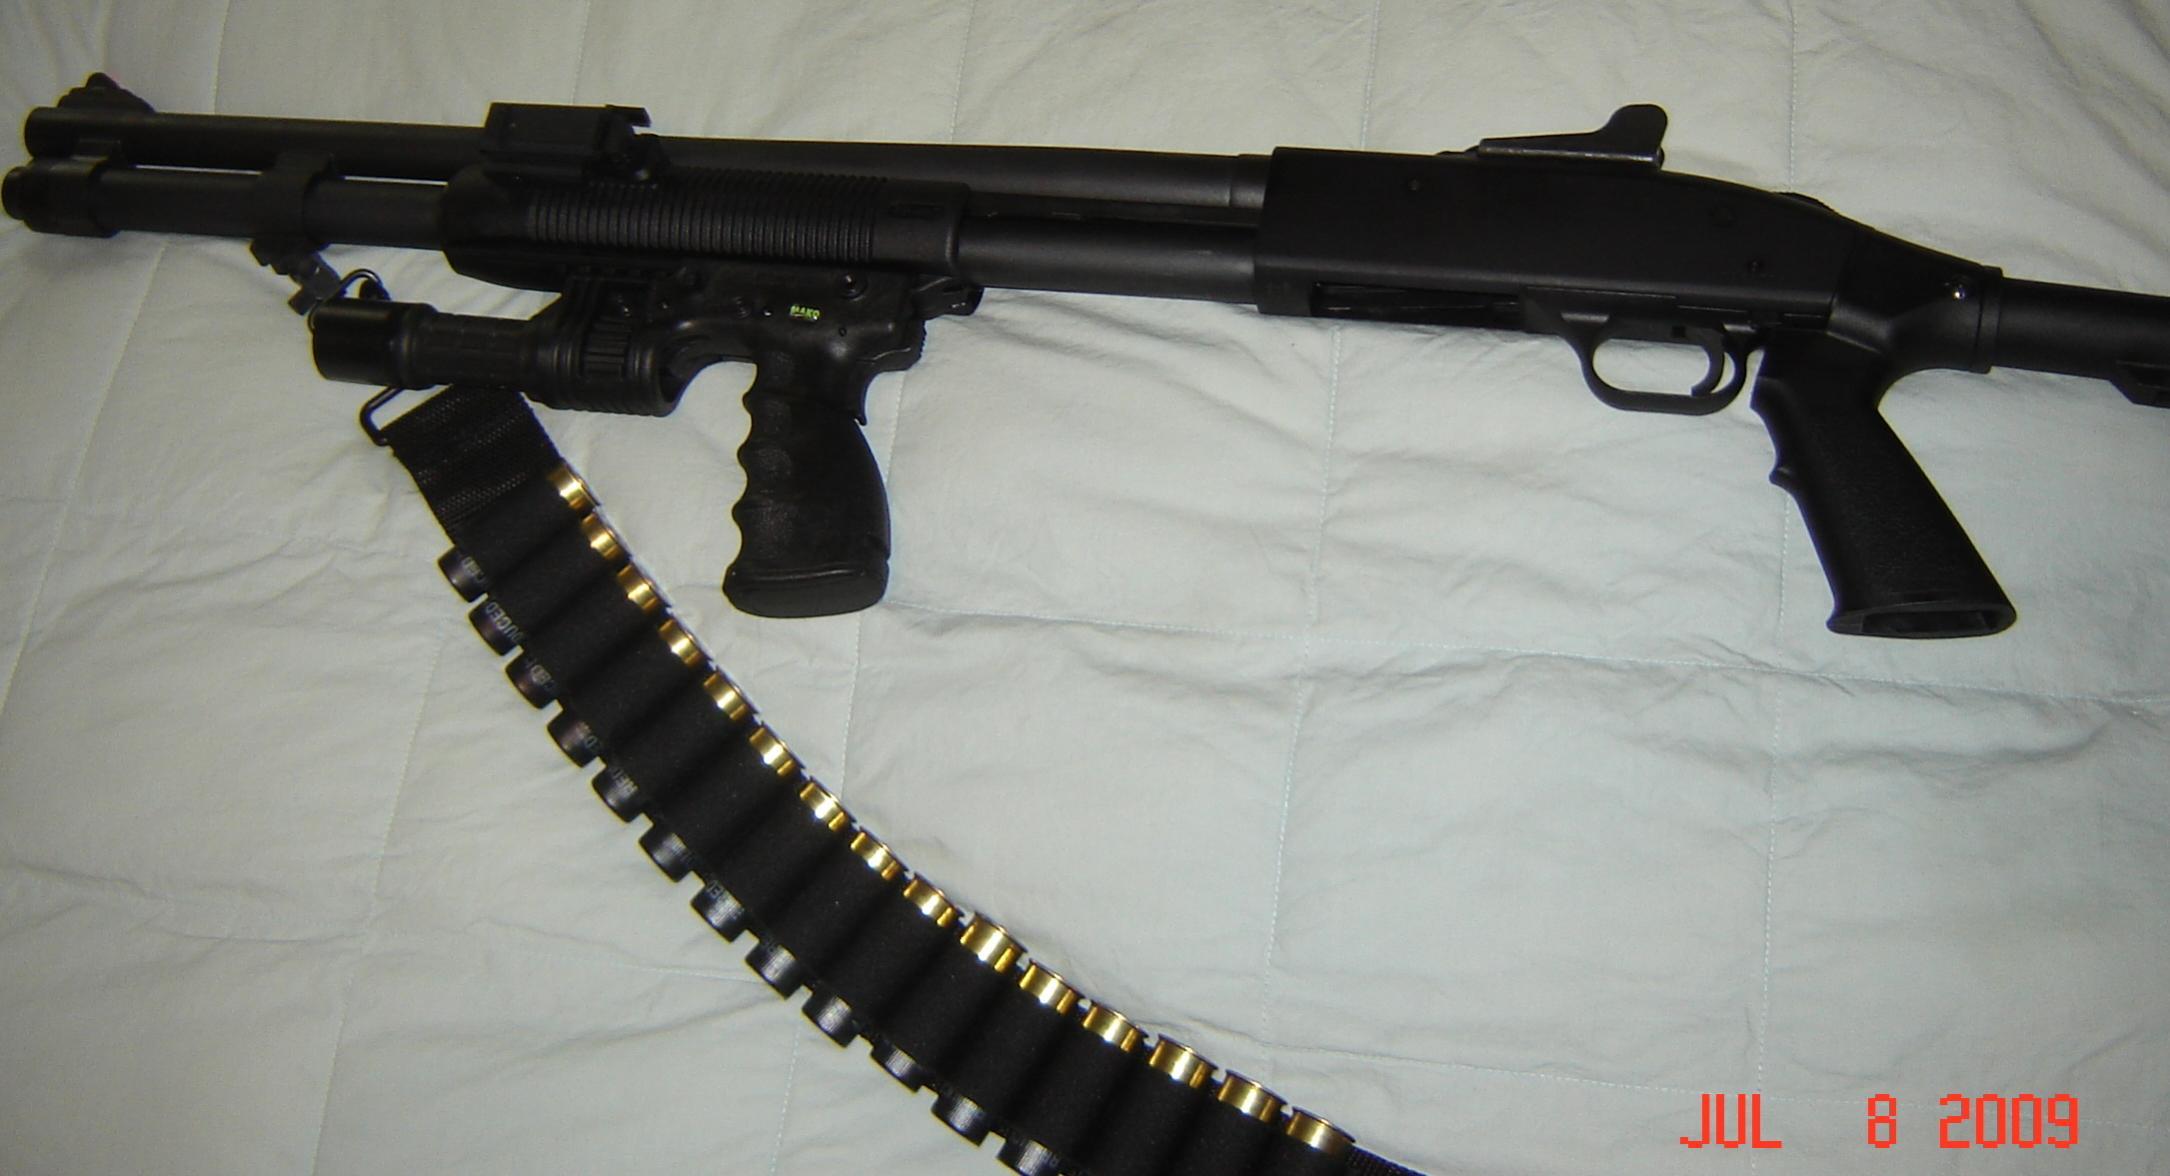 Recommendations for BRIGHT light for Mossberg 500-pistol-grip-pump-001.jpg